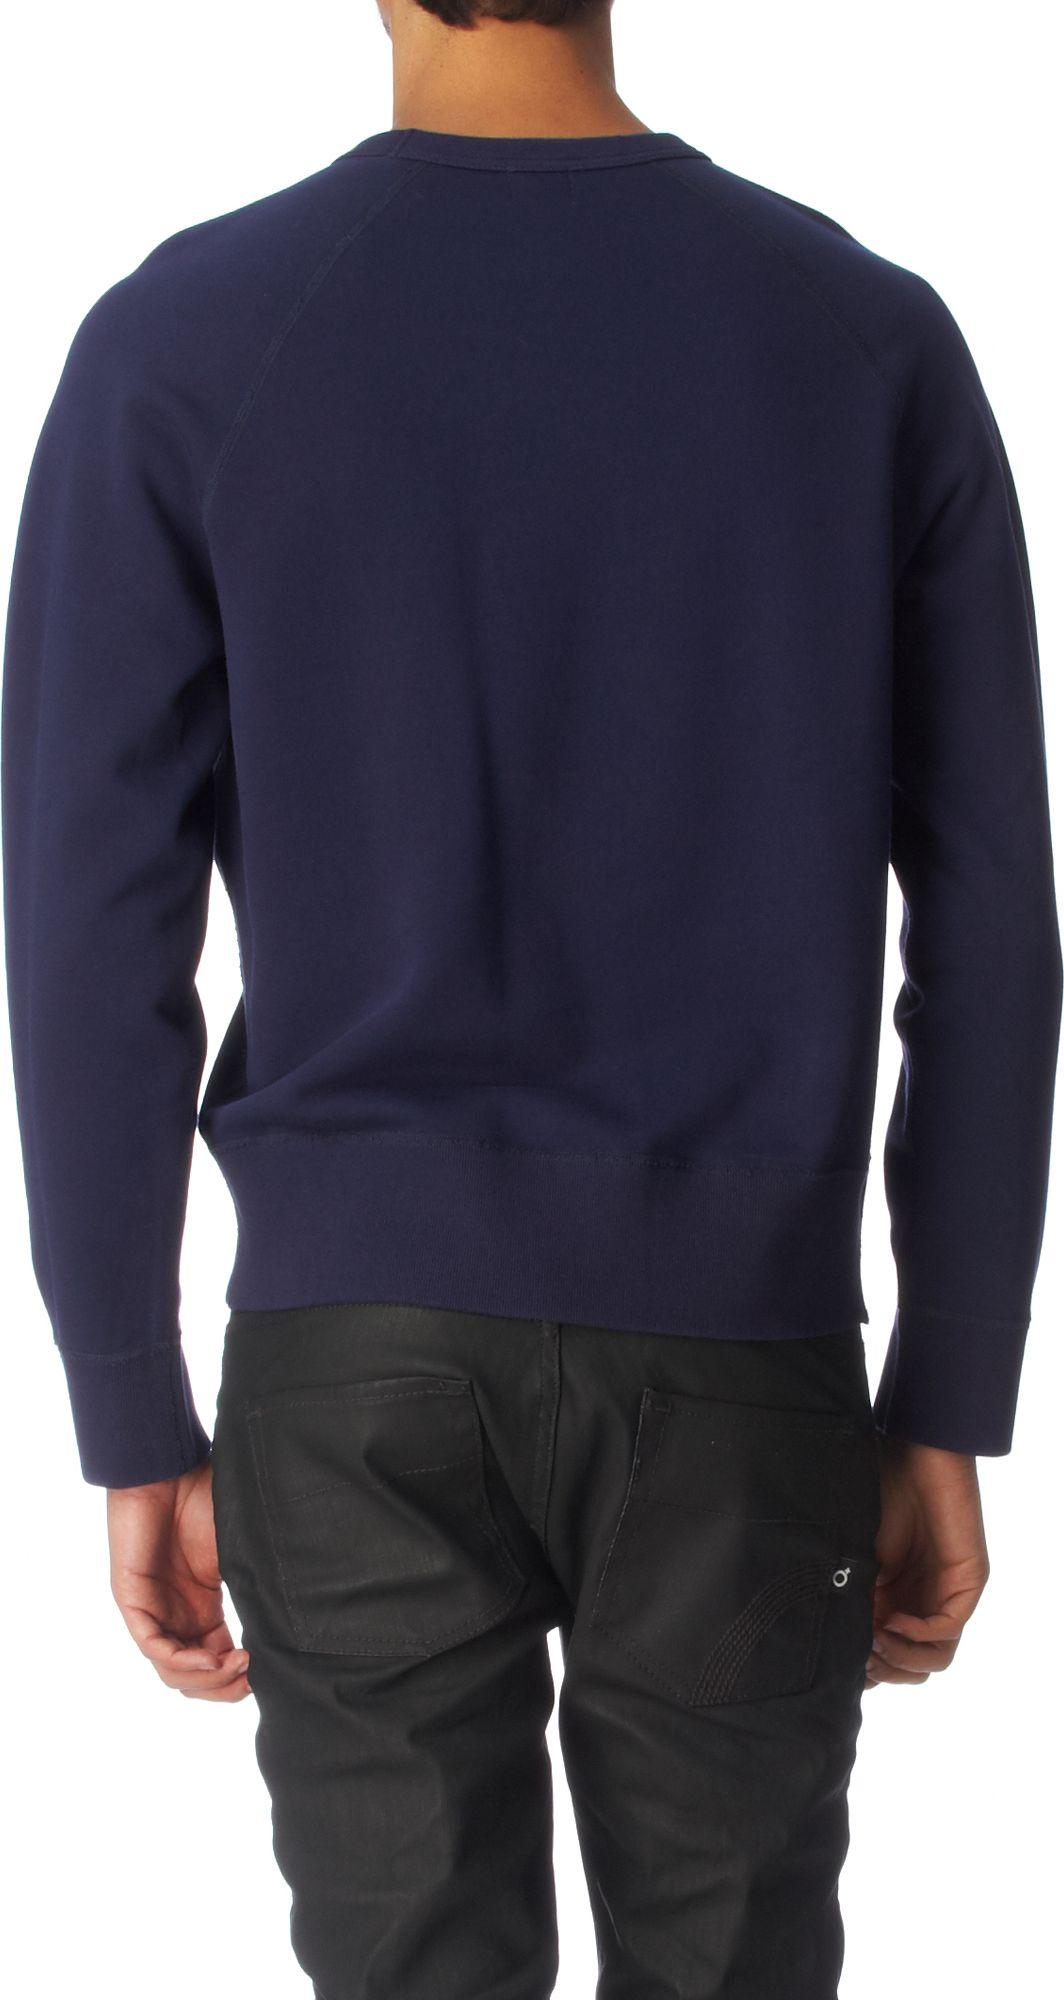 Acne Studios College Peace Sweatshirt in Navy (Blue) for Men